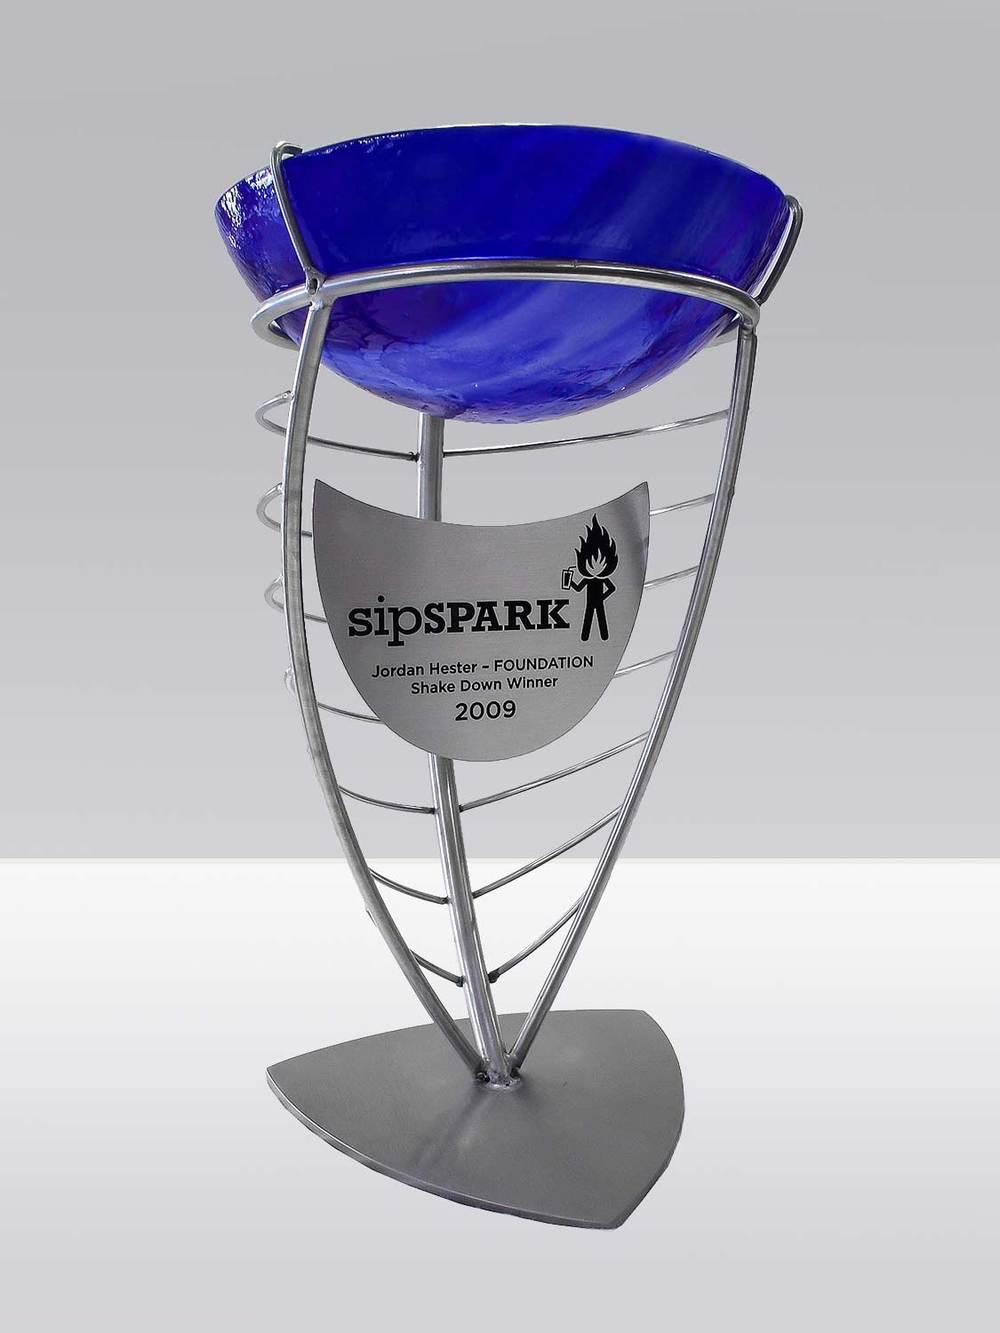 sipSpark-Highres-01.jpg